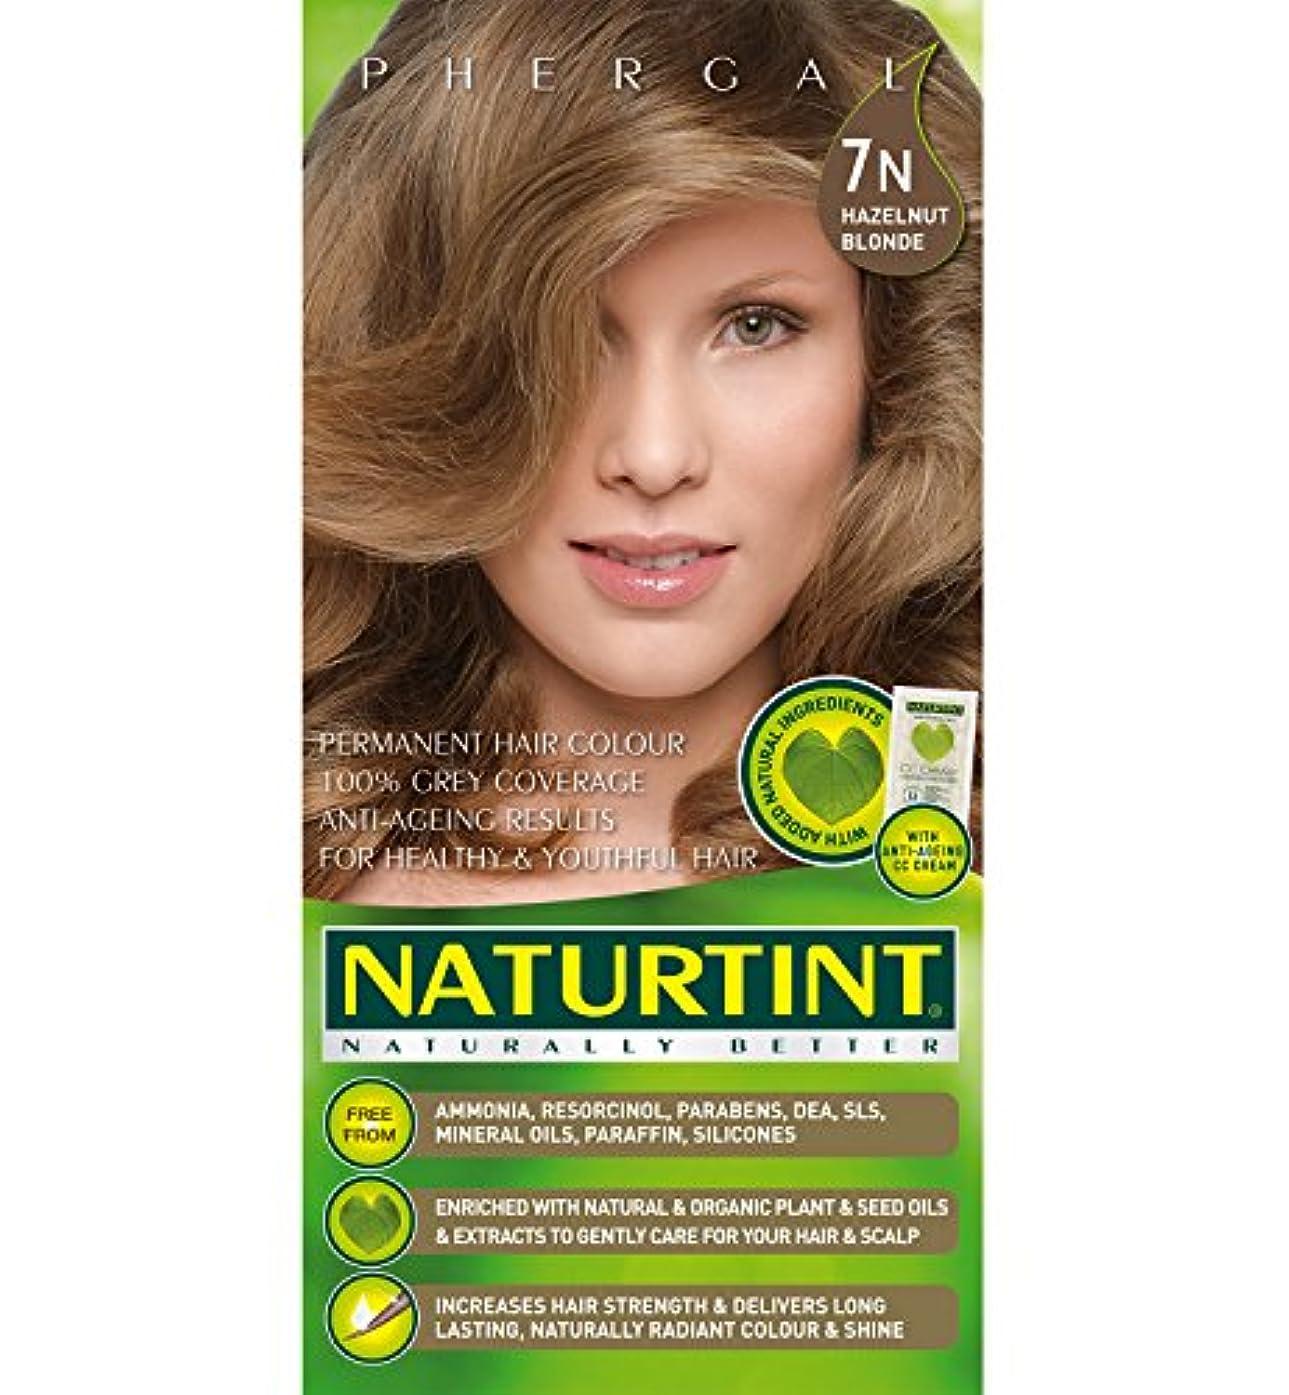 転倒用量前提Naturtint Hair Color 7N Hazelnut Blonde Count (並行輸入品)